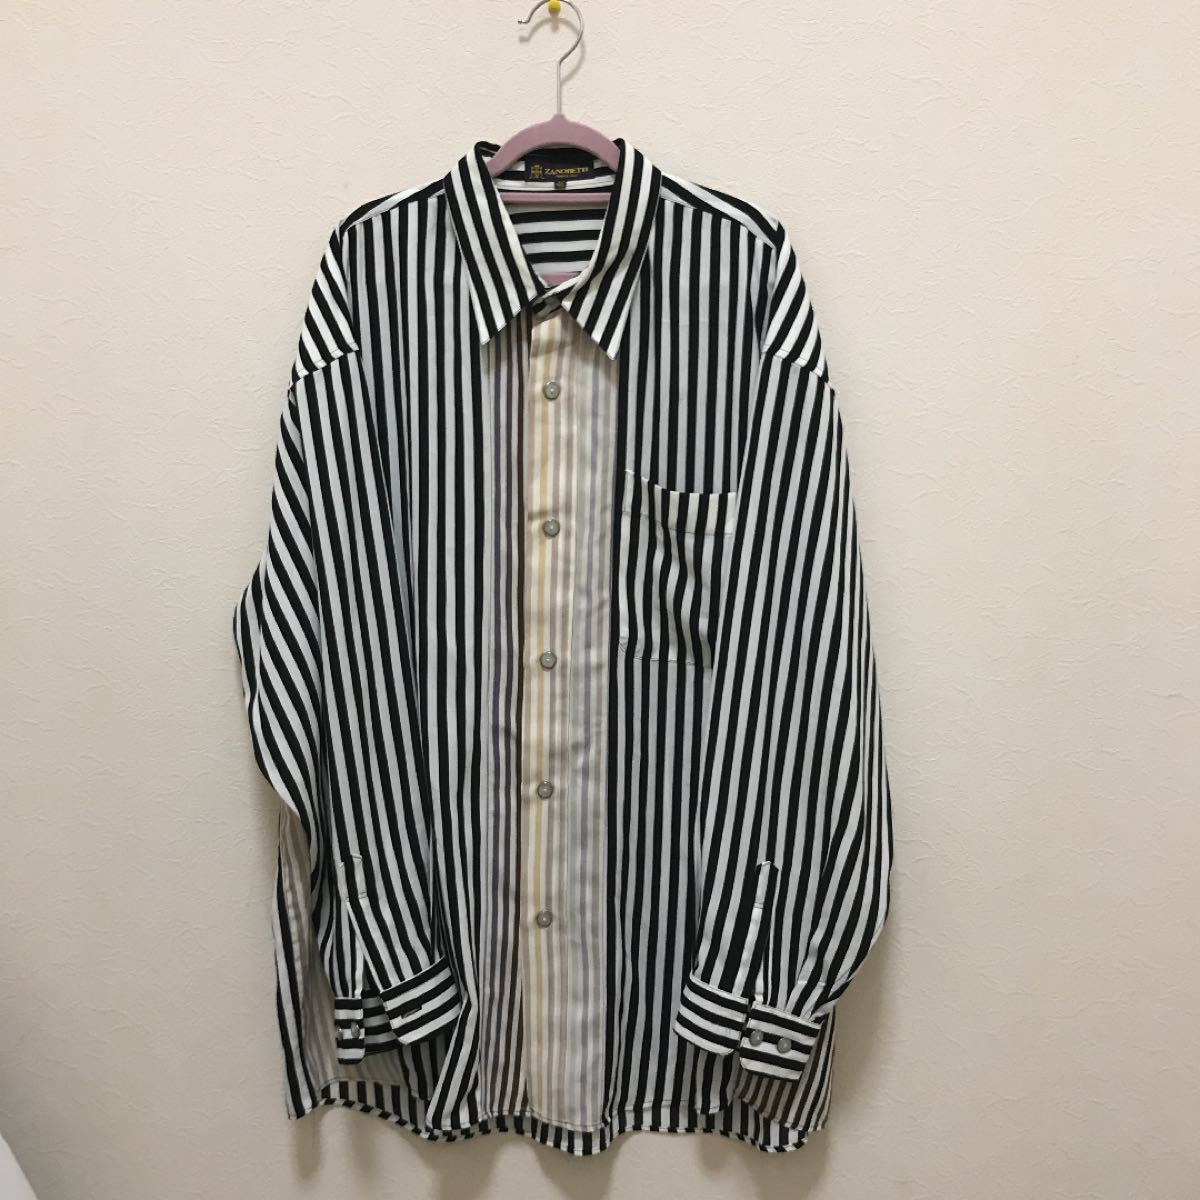 【ZANOBETTI】メンズ シャツ ストライプシャツ 総柄 グラデーション